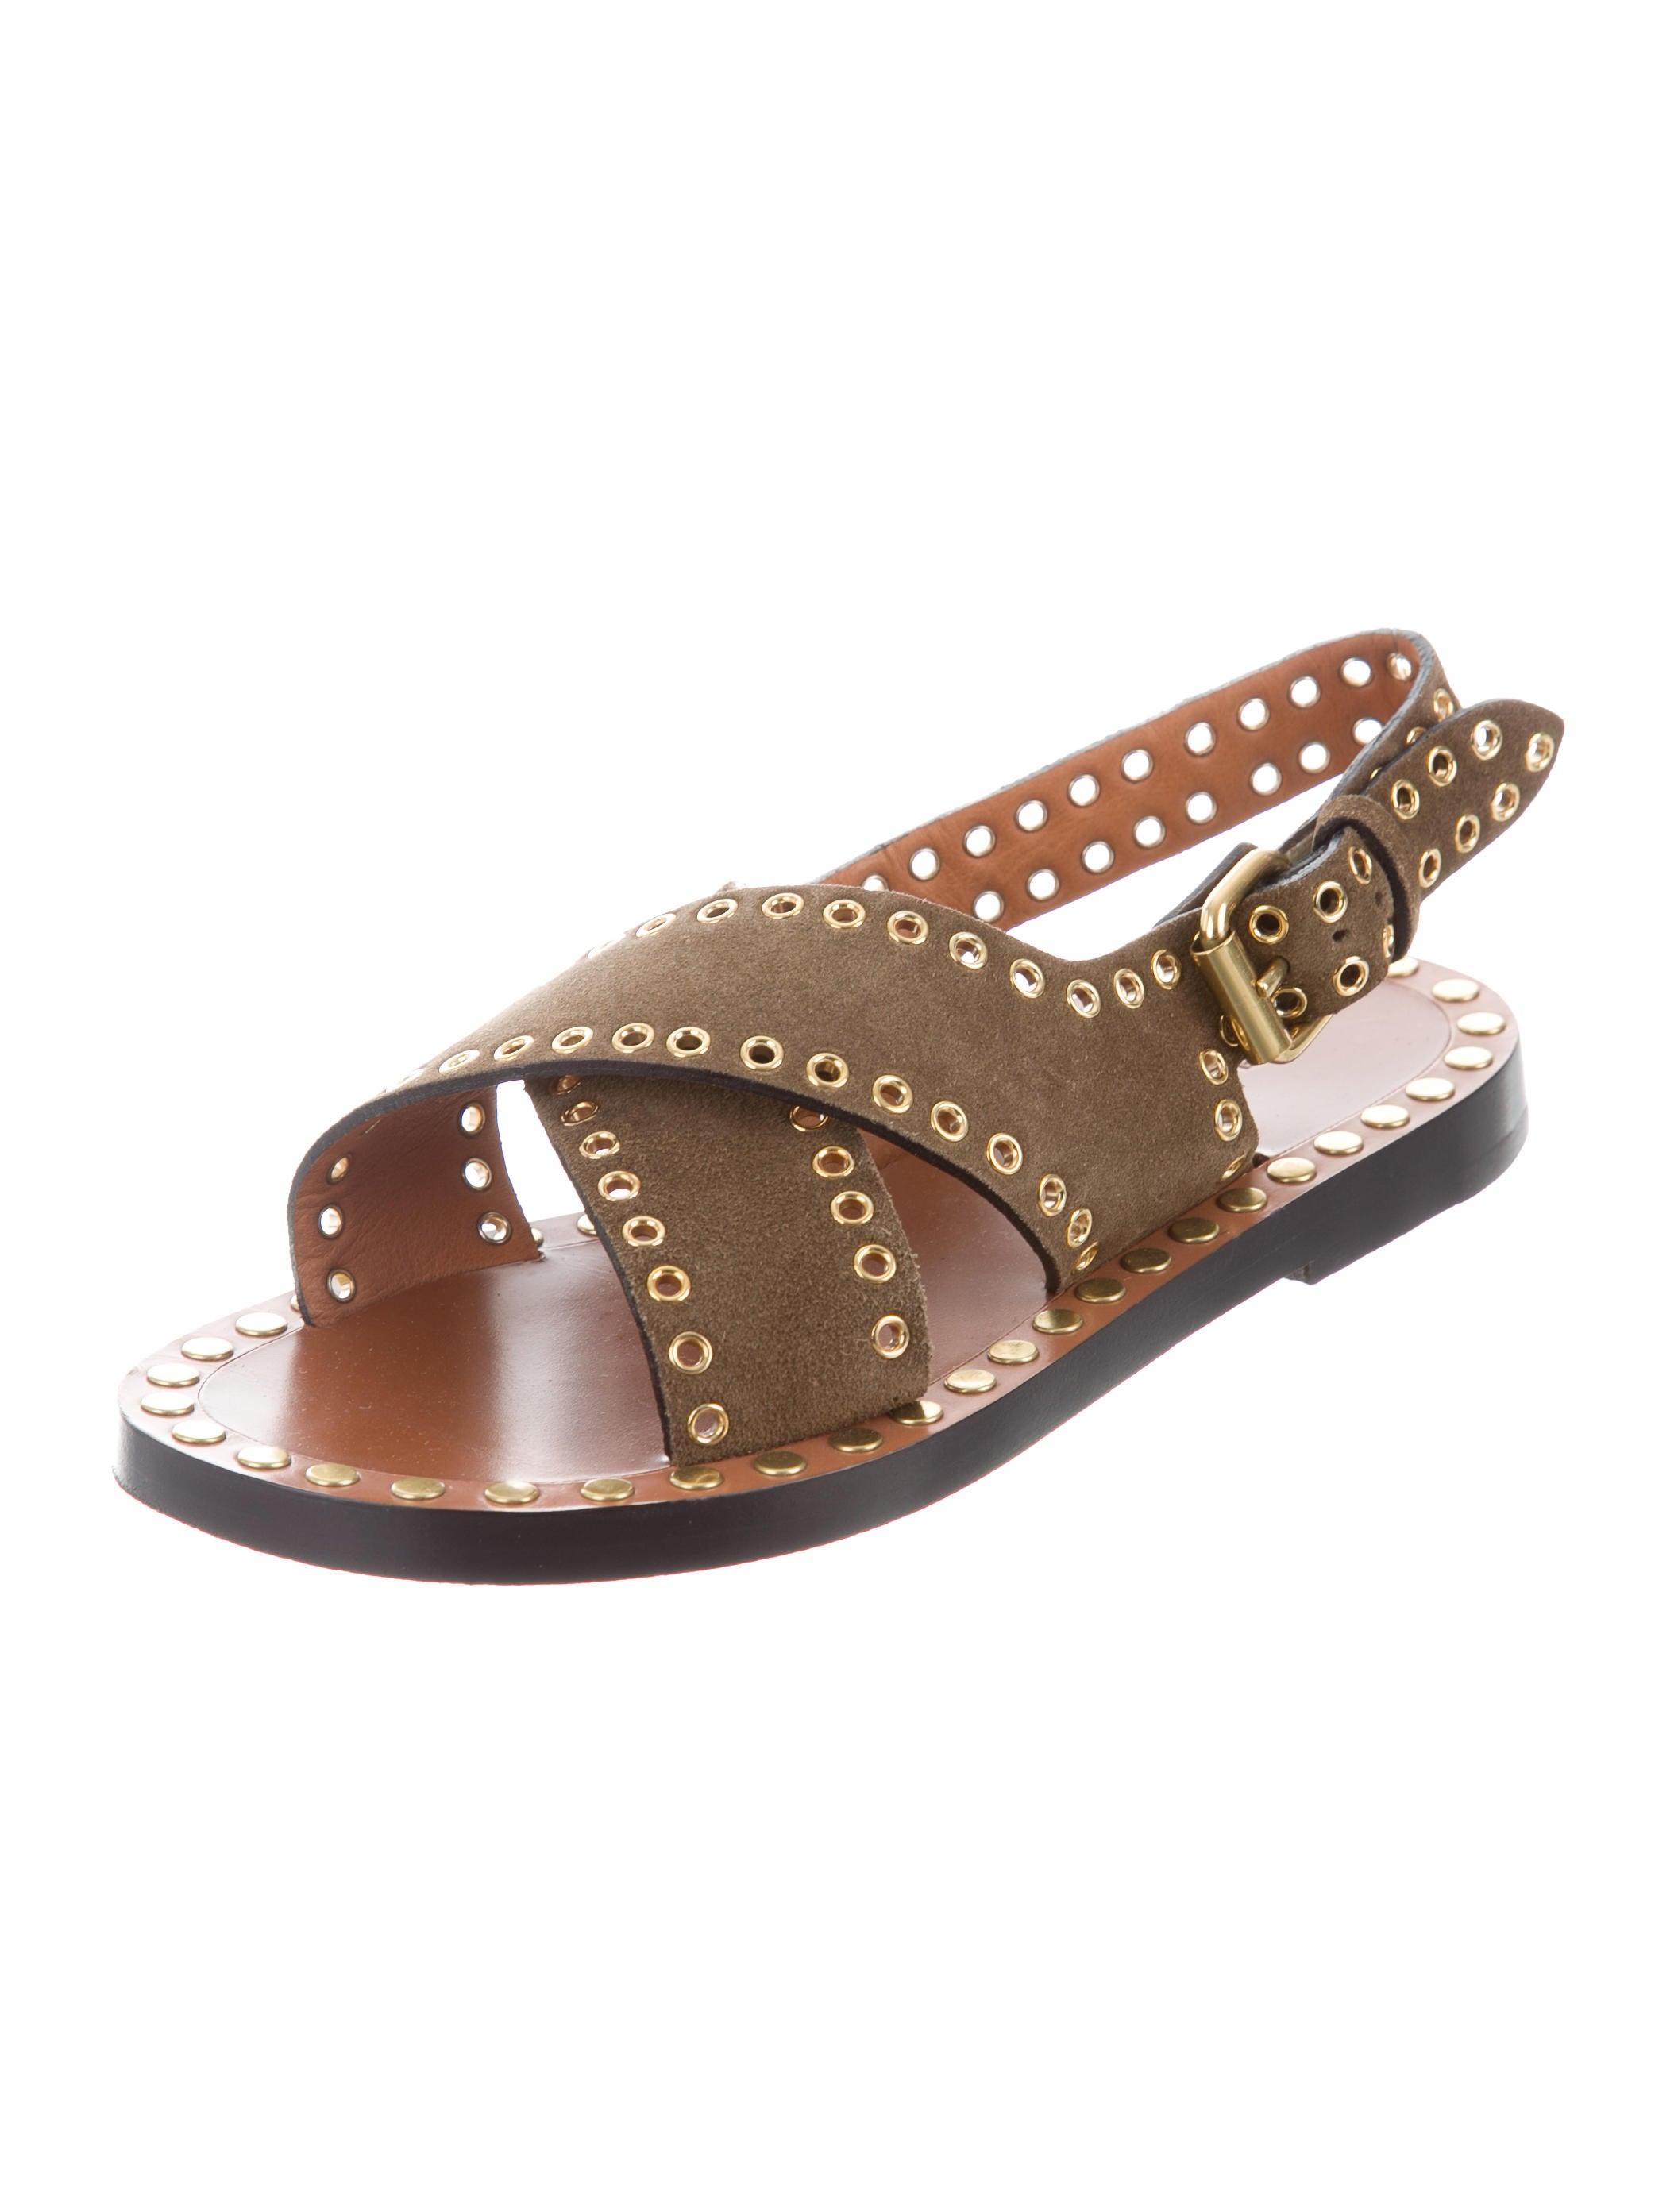 Isabel Marant Grommet-Embellished Crossover Sandals discount how much exclusive cheap online deals cheap online wholesale online VU8zhBFewc